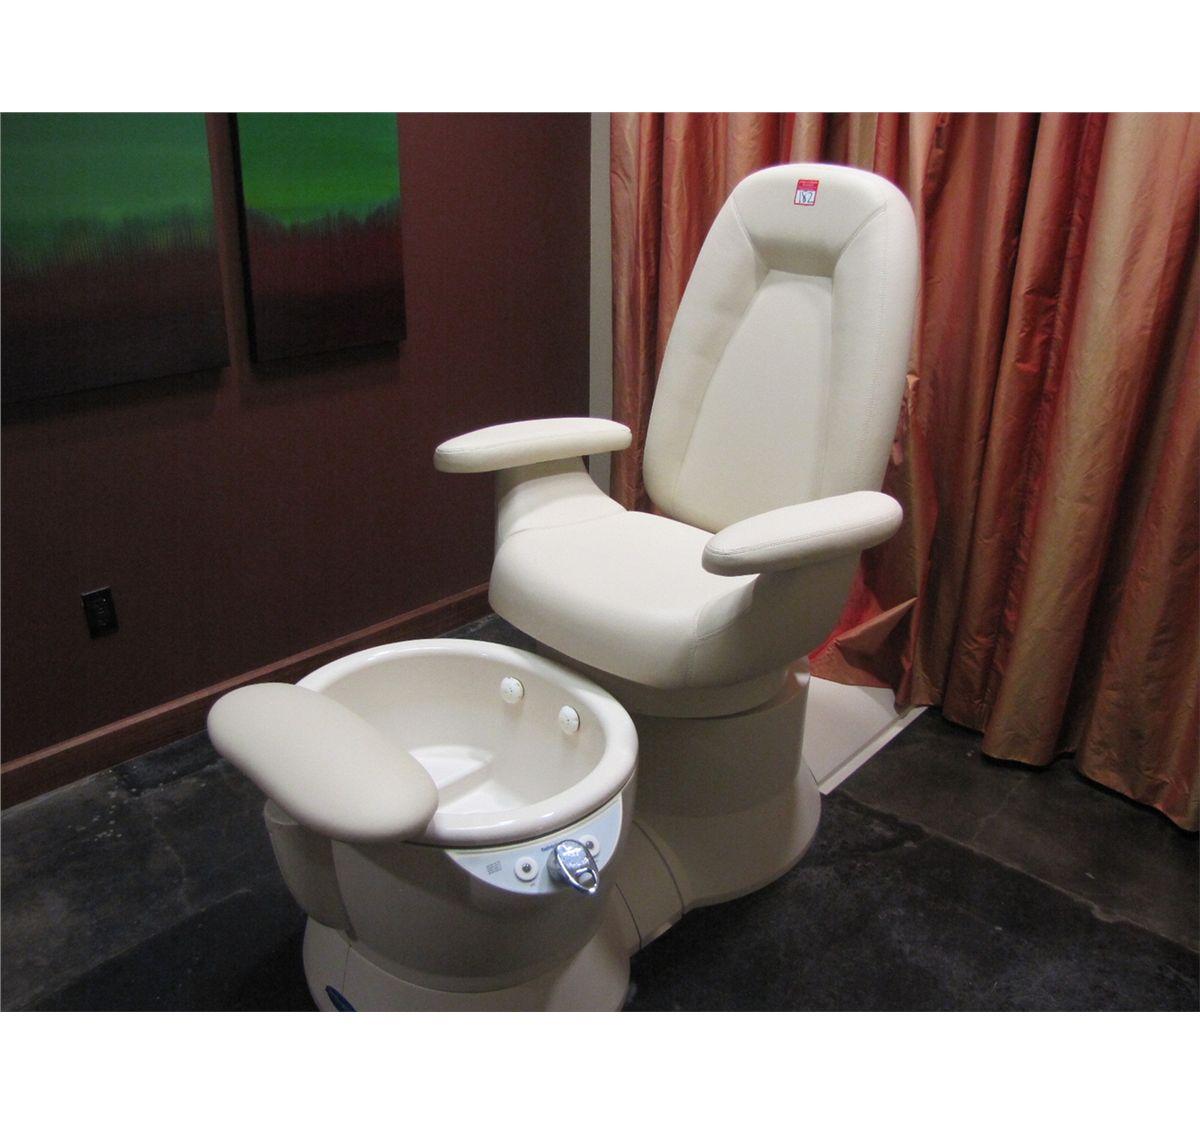 belvedere whirlpool pedicure spa chair model 101907 rh icollector com